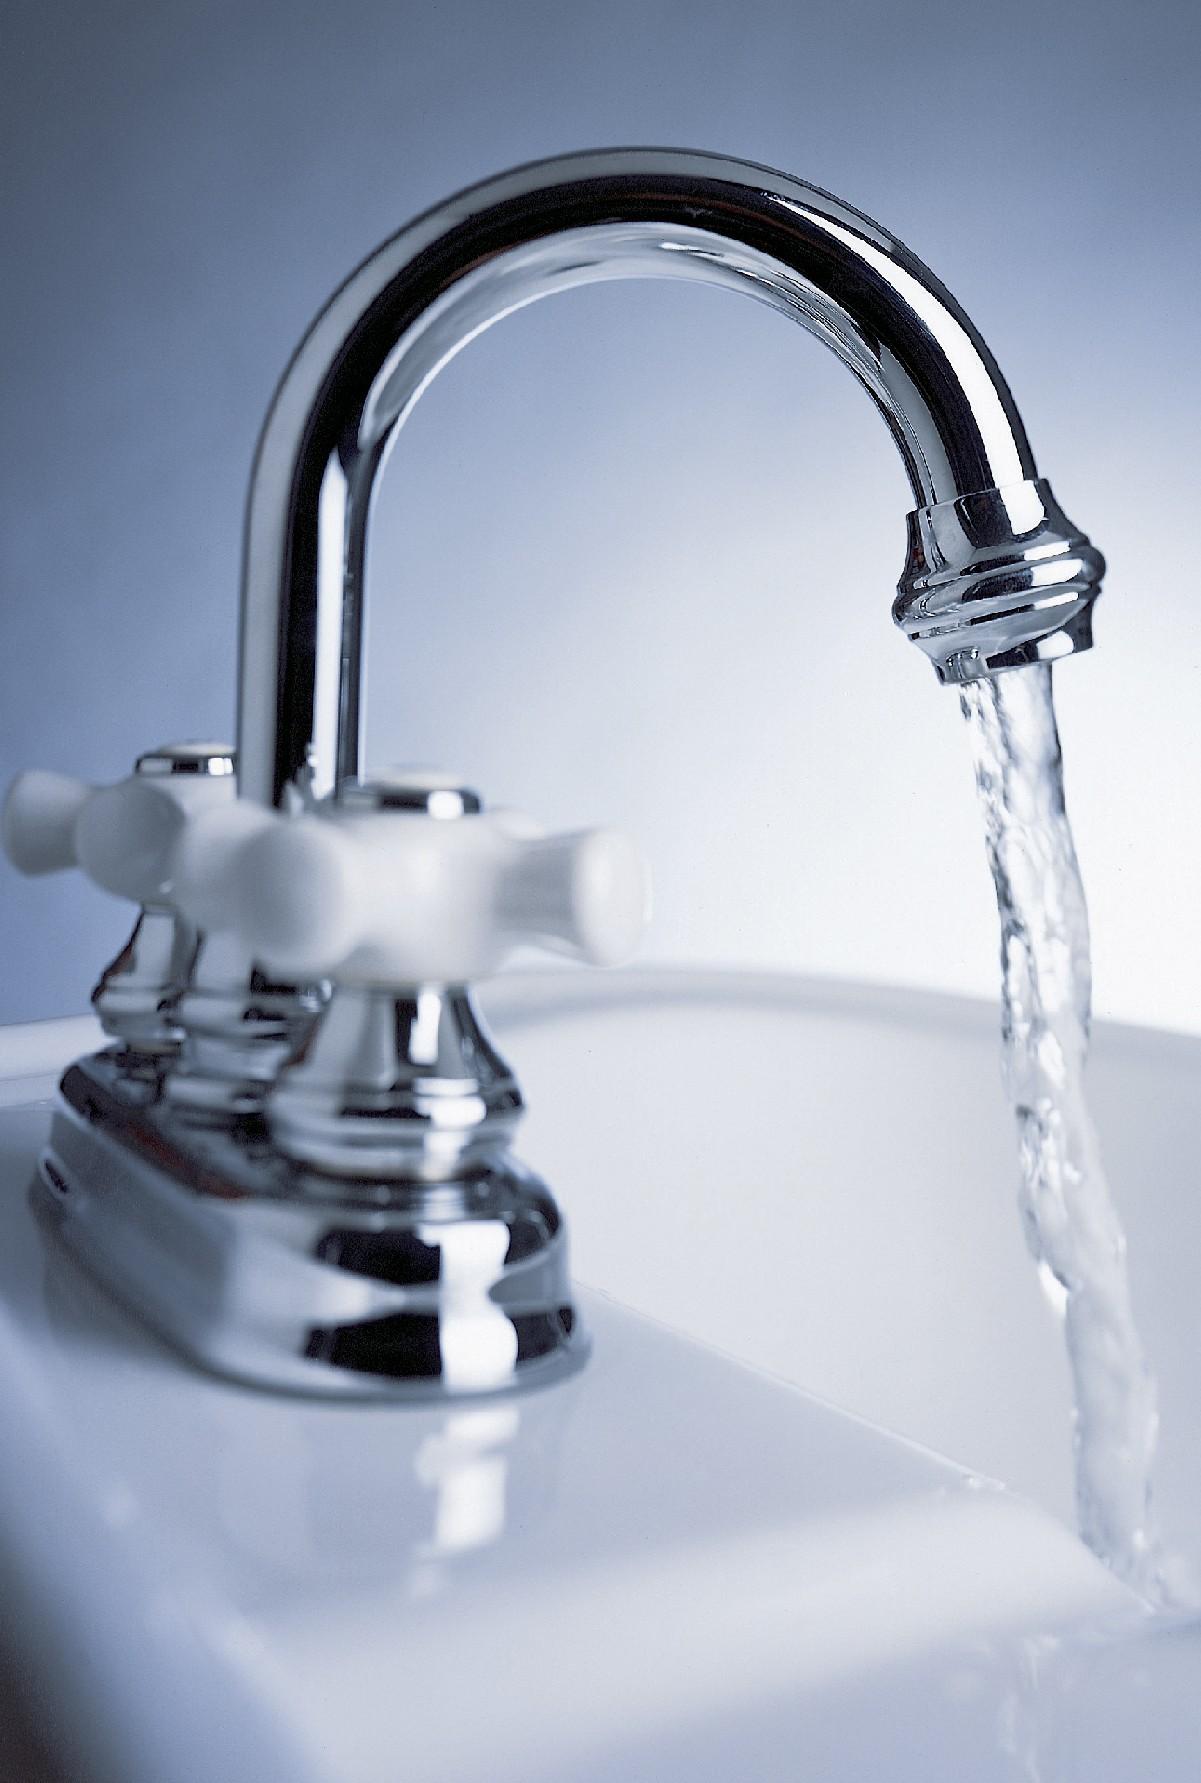 http://plumbing-auburn-ca.com/contractor-supplies-service/wp-content/gallery/home/sink.jpg